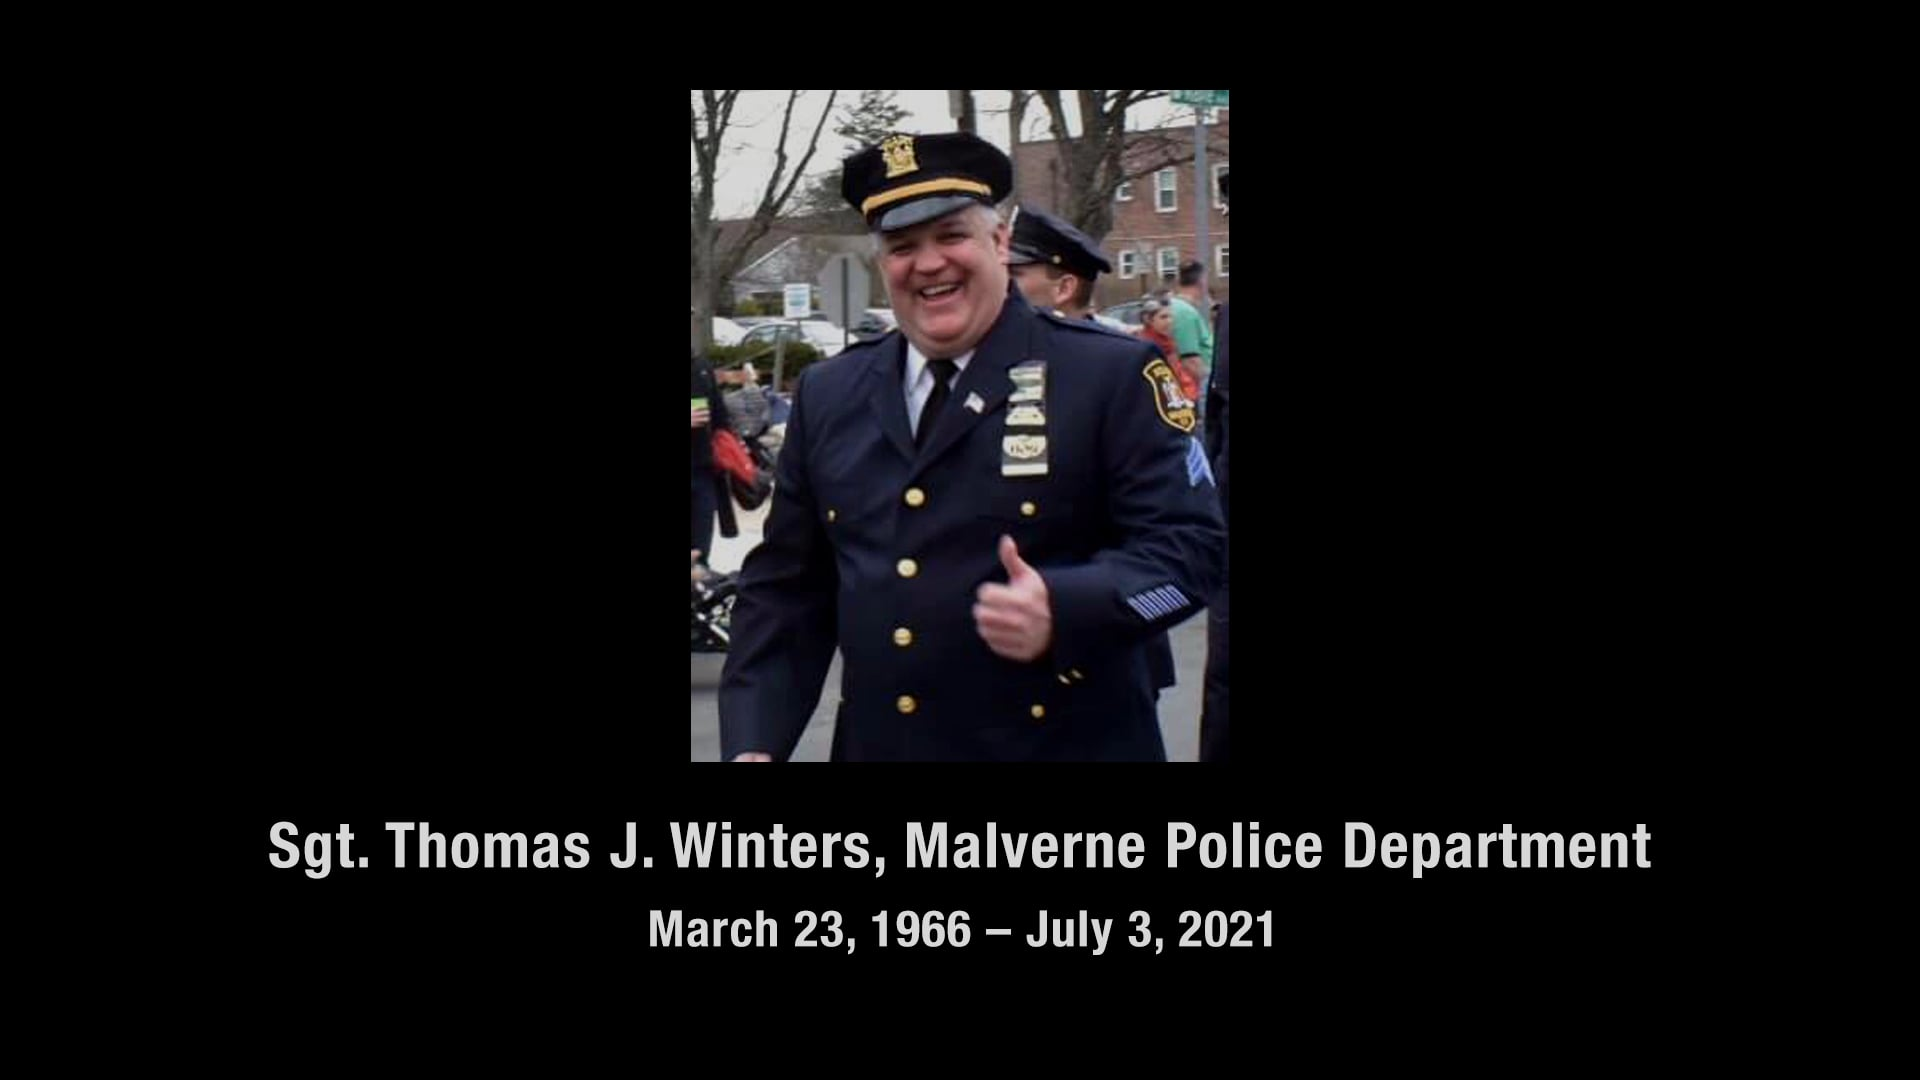 Sgt. Thomas J. Winters